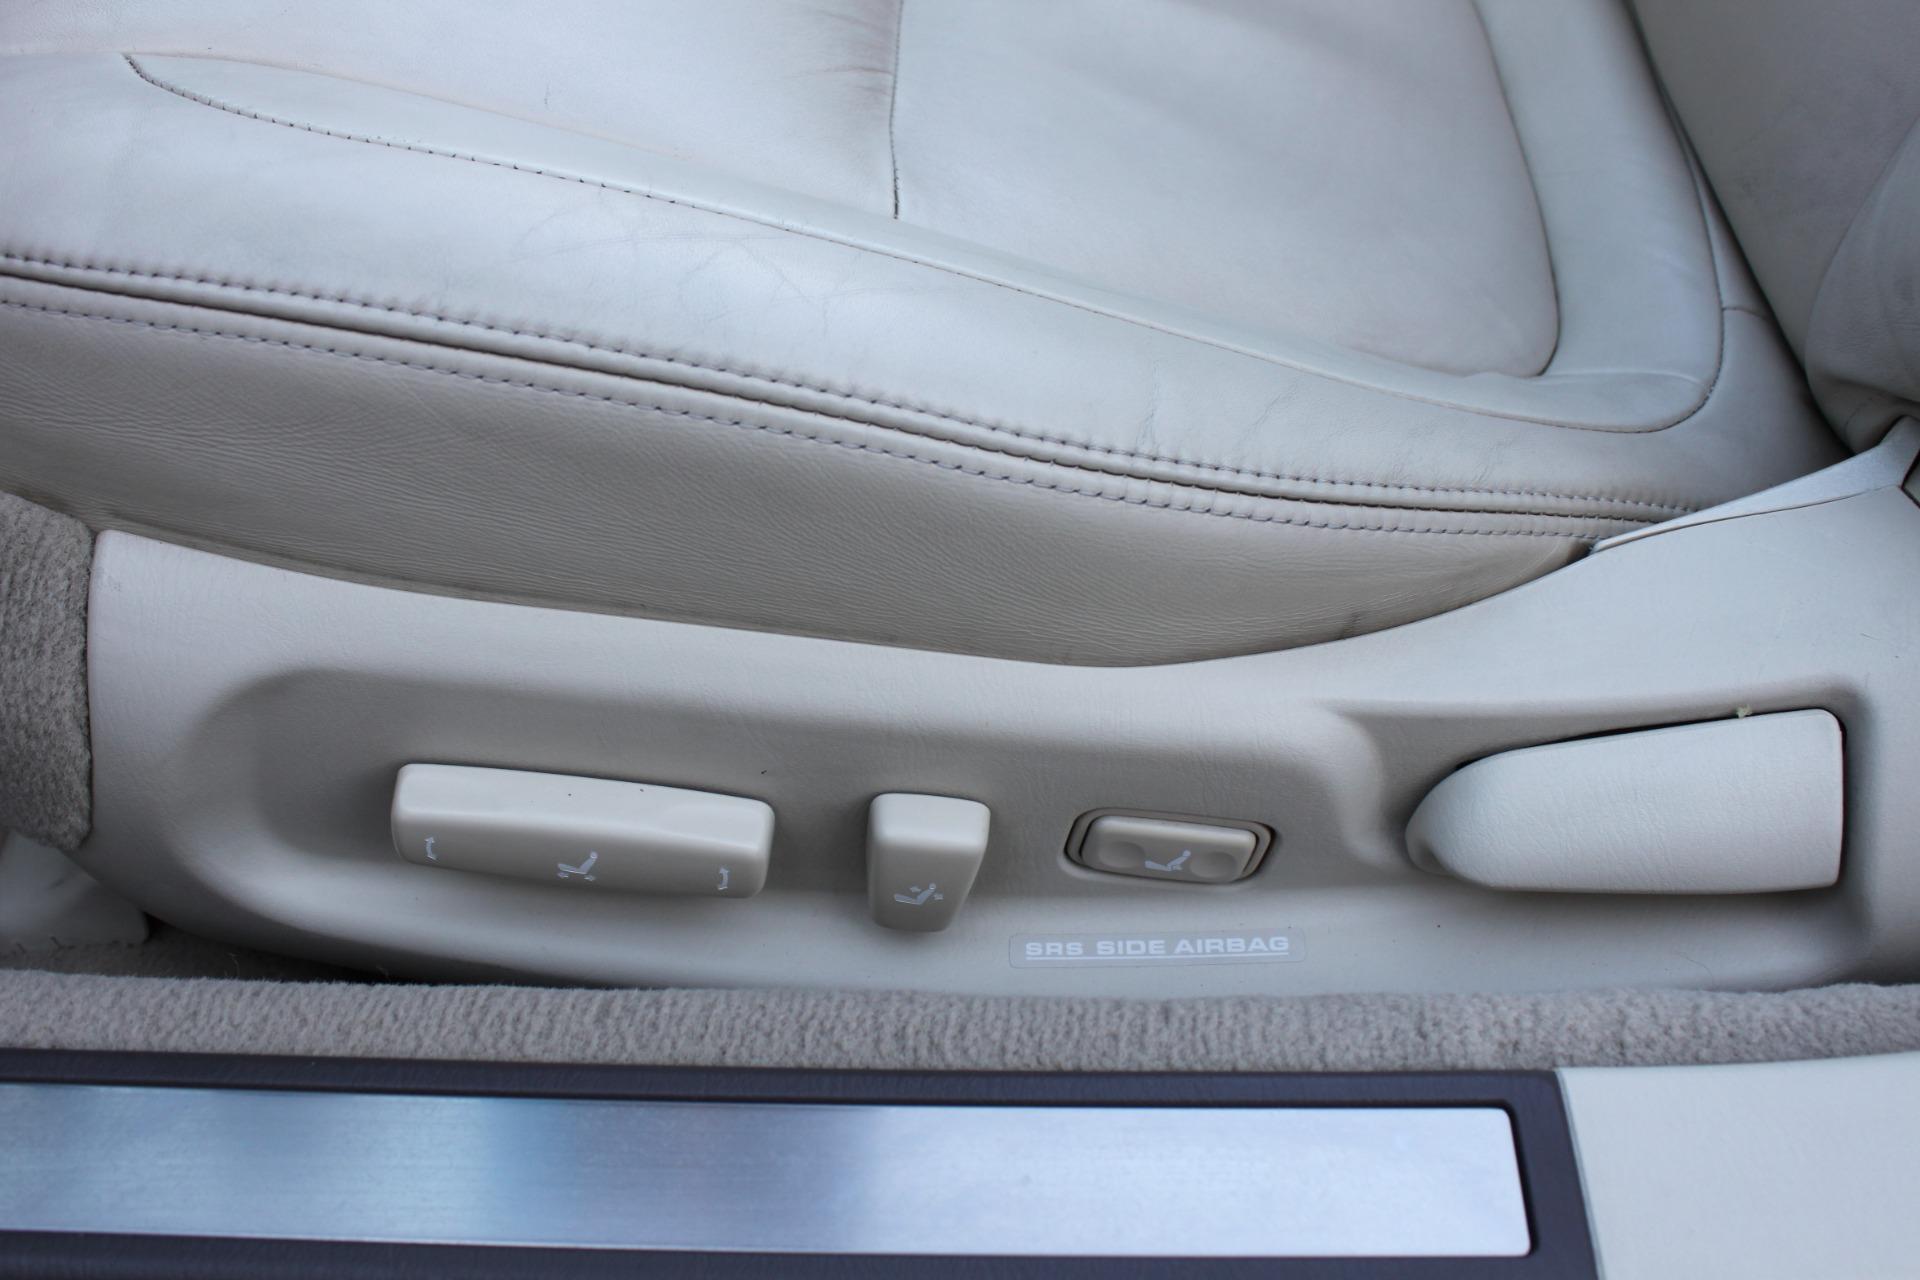 Used-2006-Lexus-SC-430-Mopar